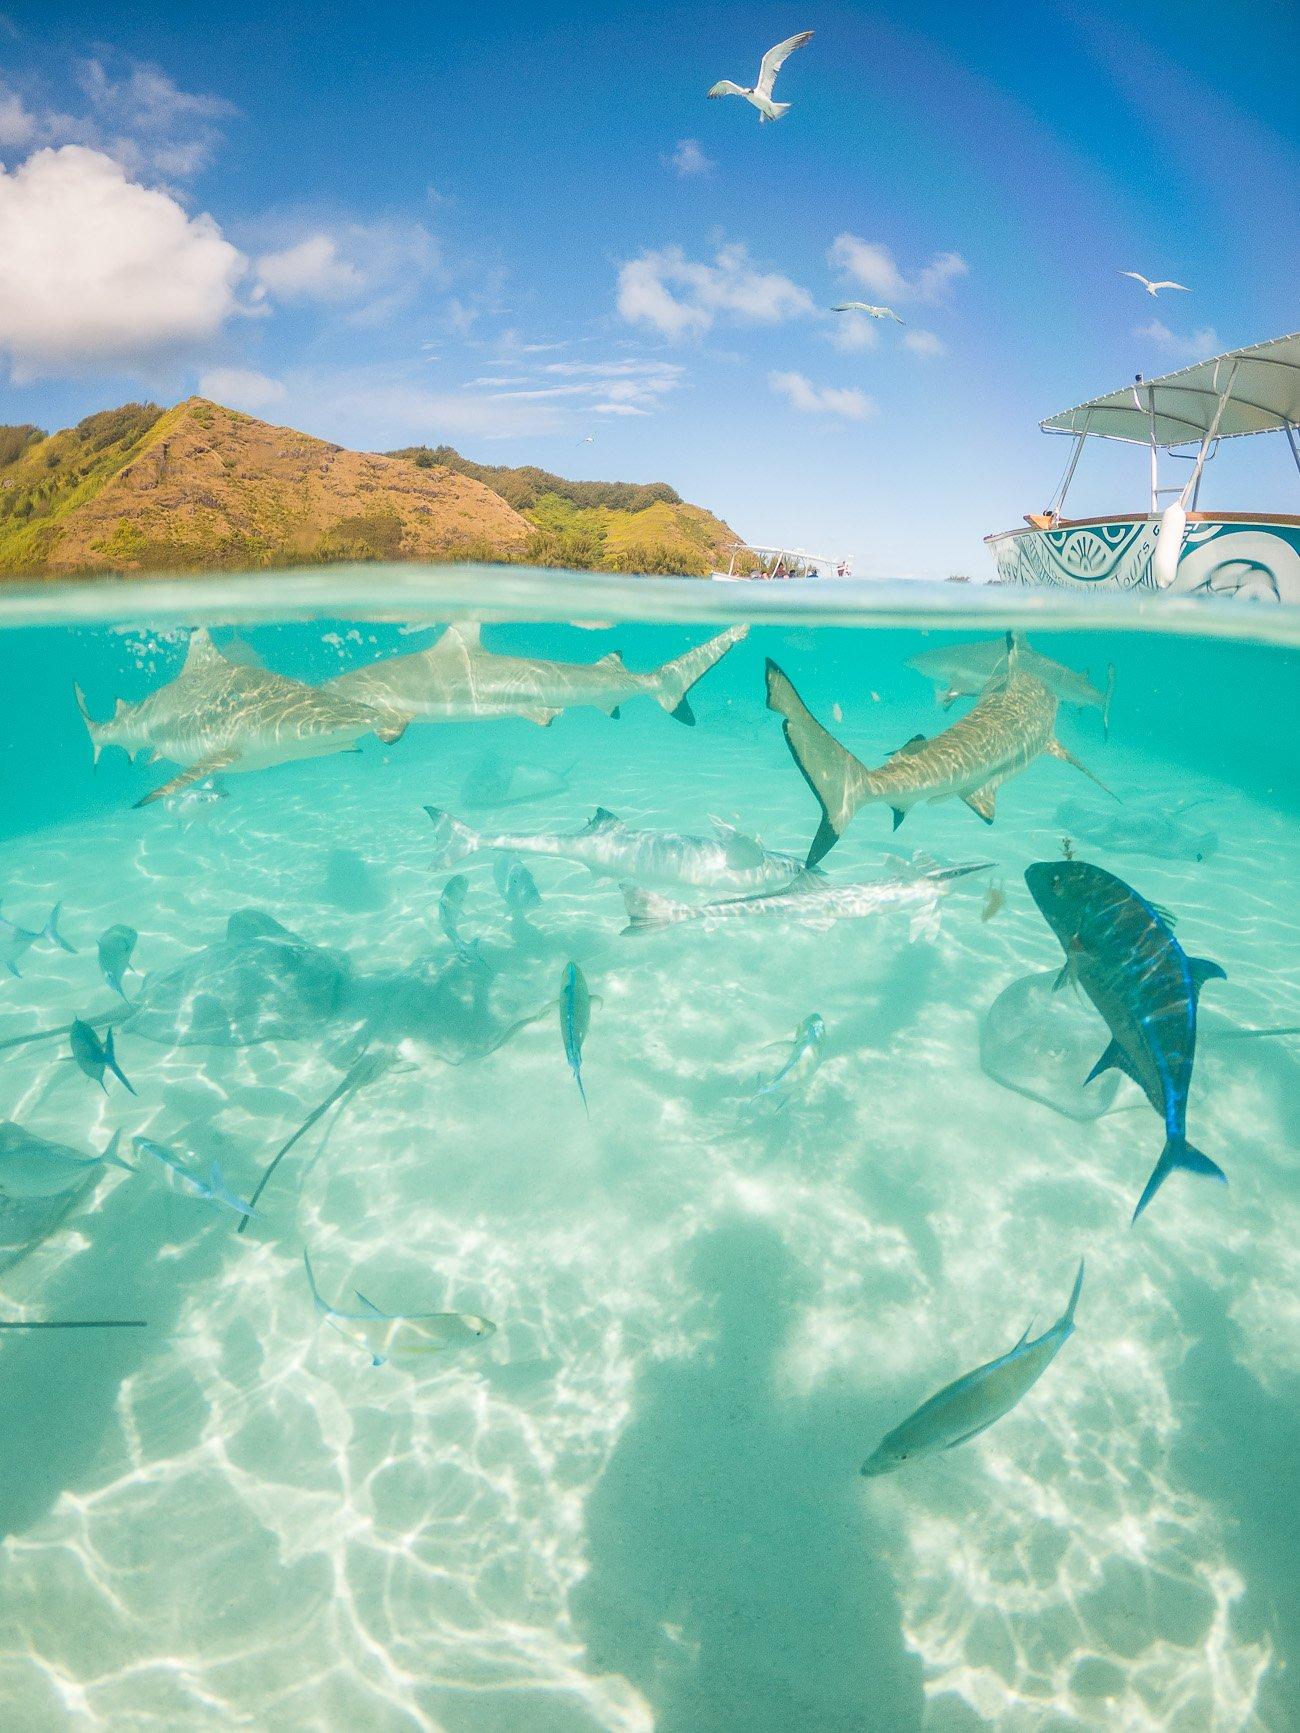 photo gopro requins